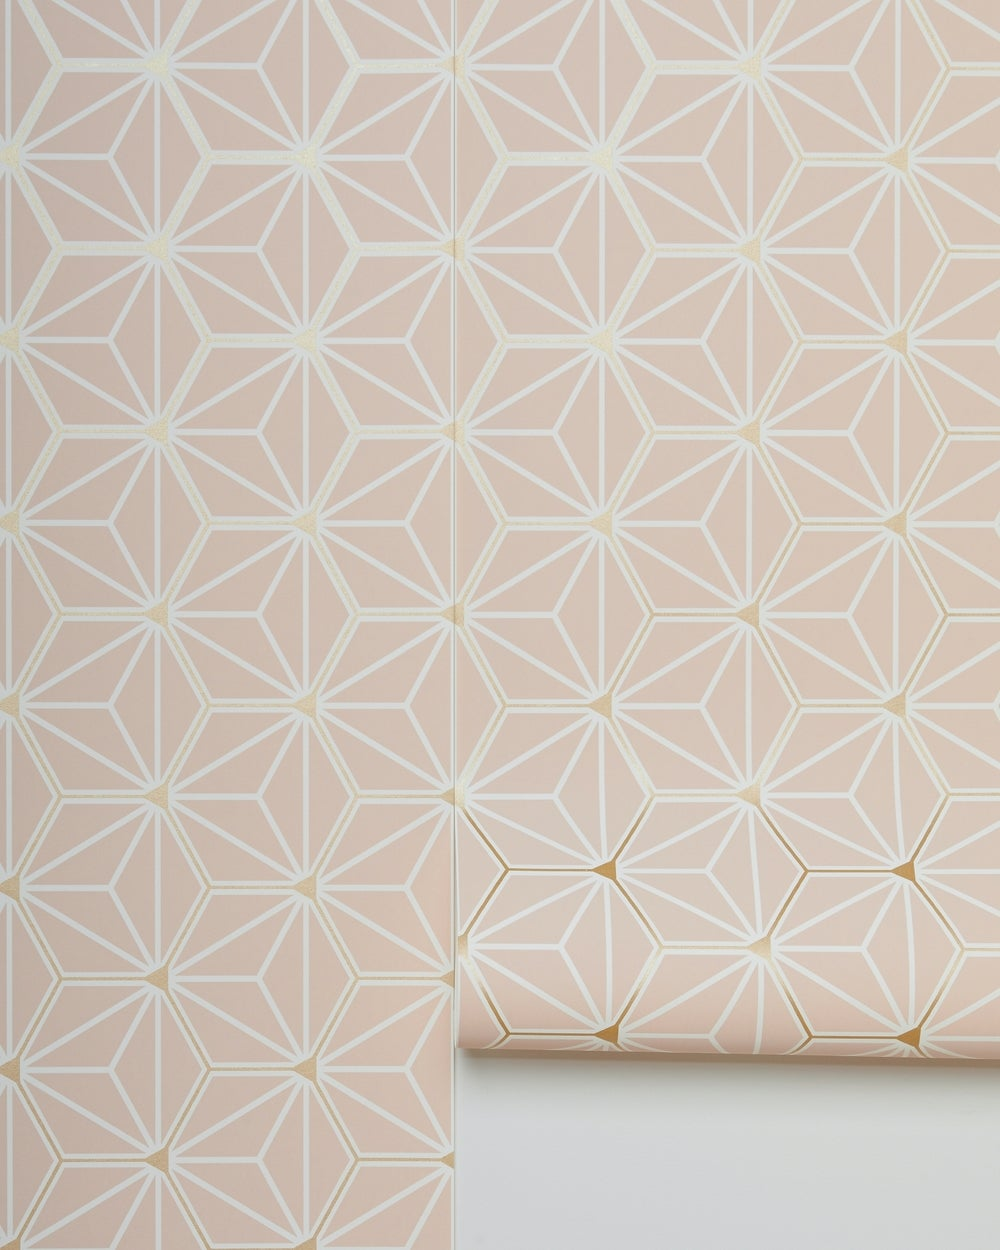 starburst_hexagon_wallpaper_by_taylor_sterling_blush-4_1_m